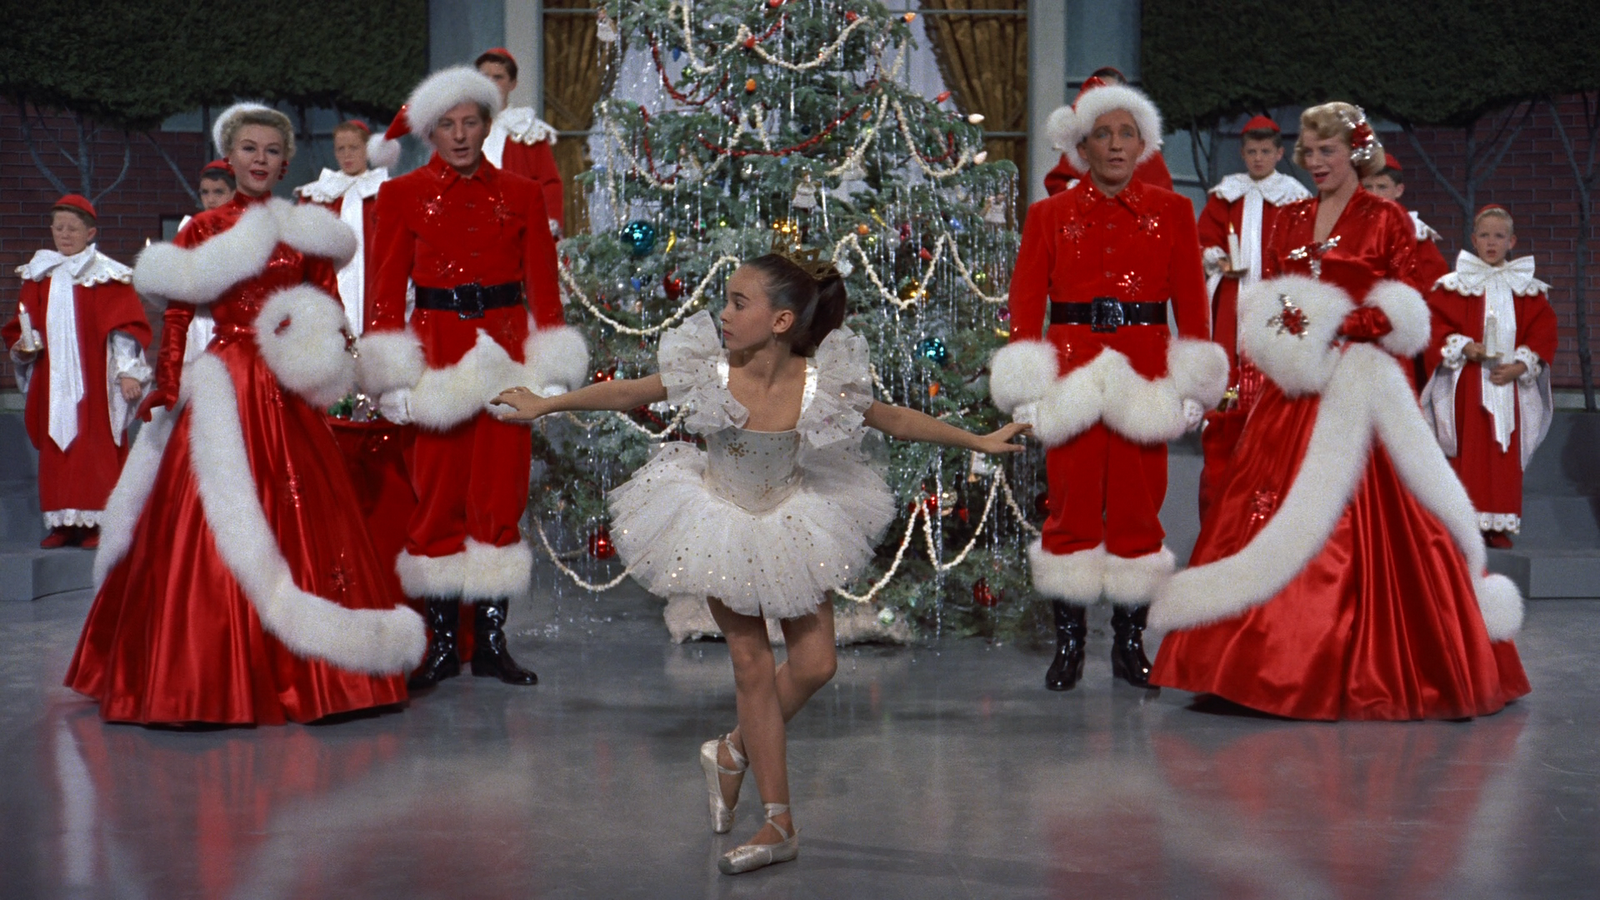 White Christmas Movie.25 Days Of Christmas Movies 10 White Christmas The